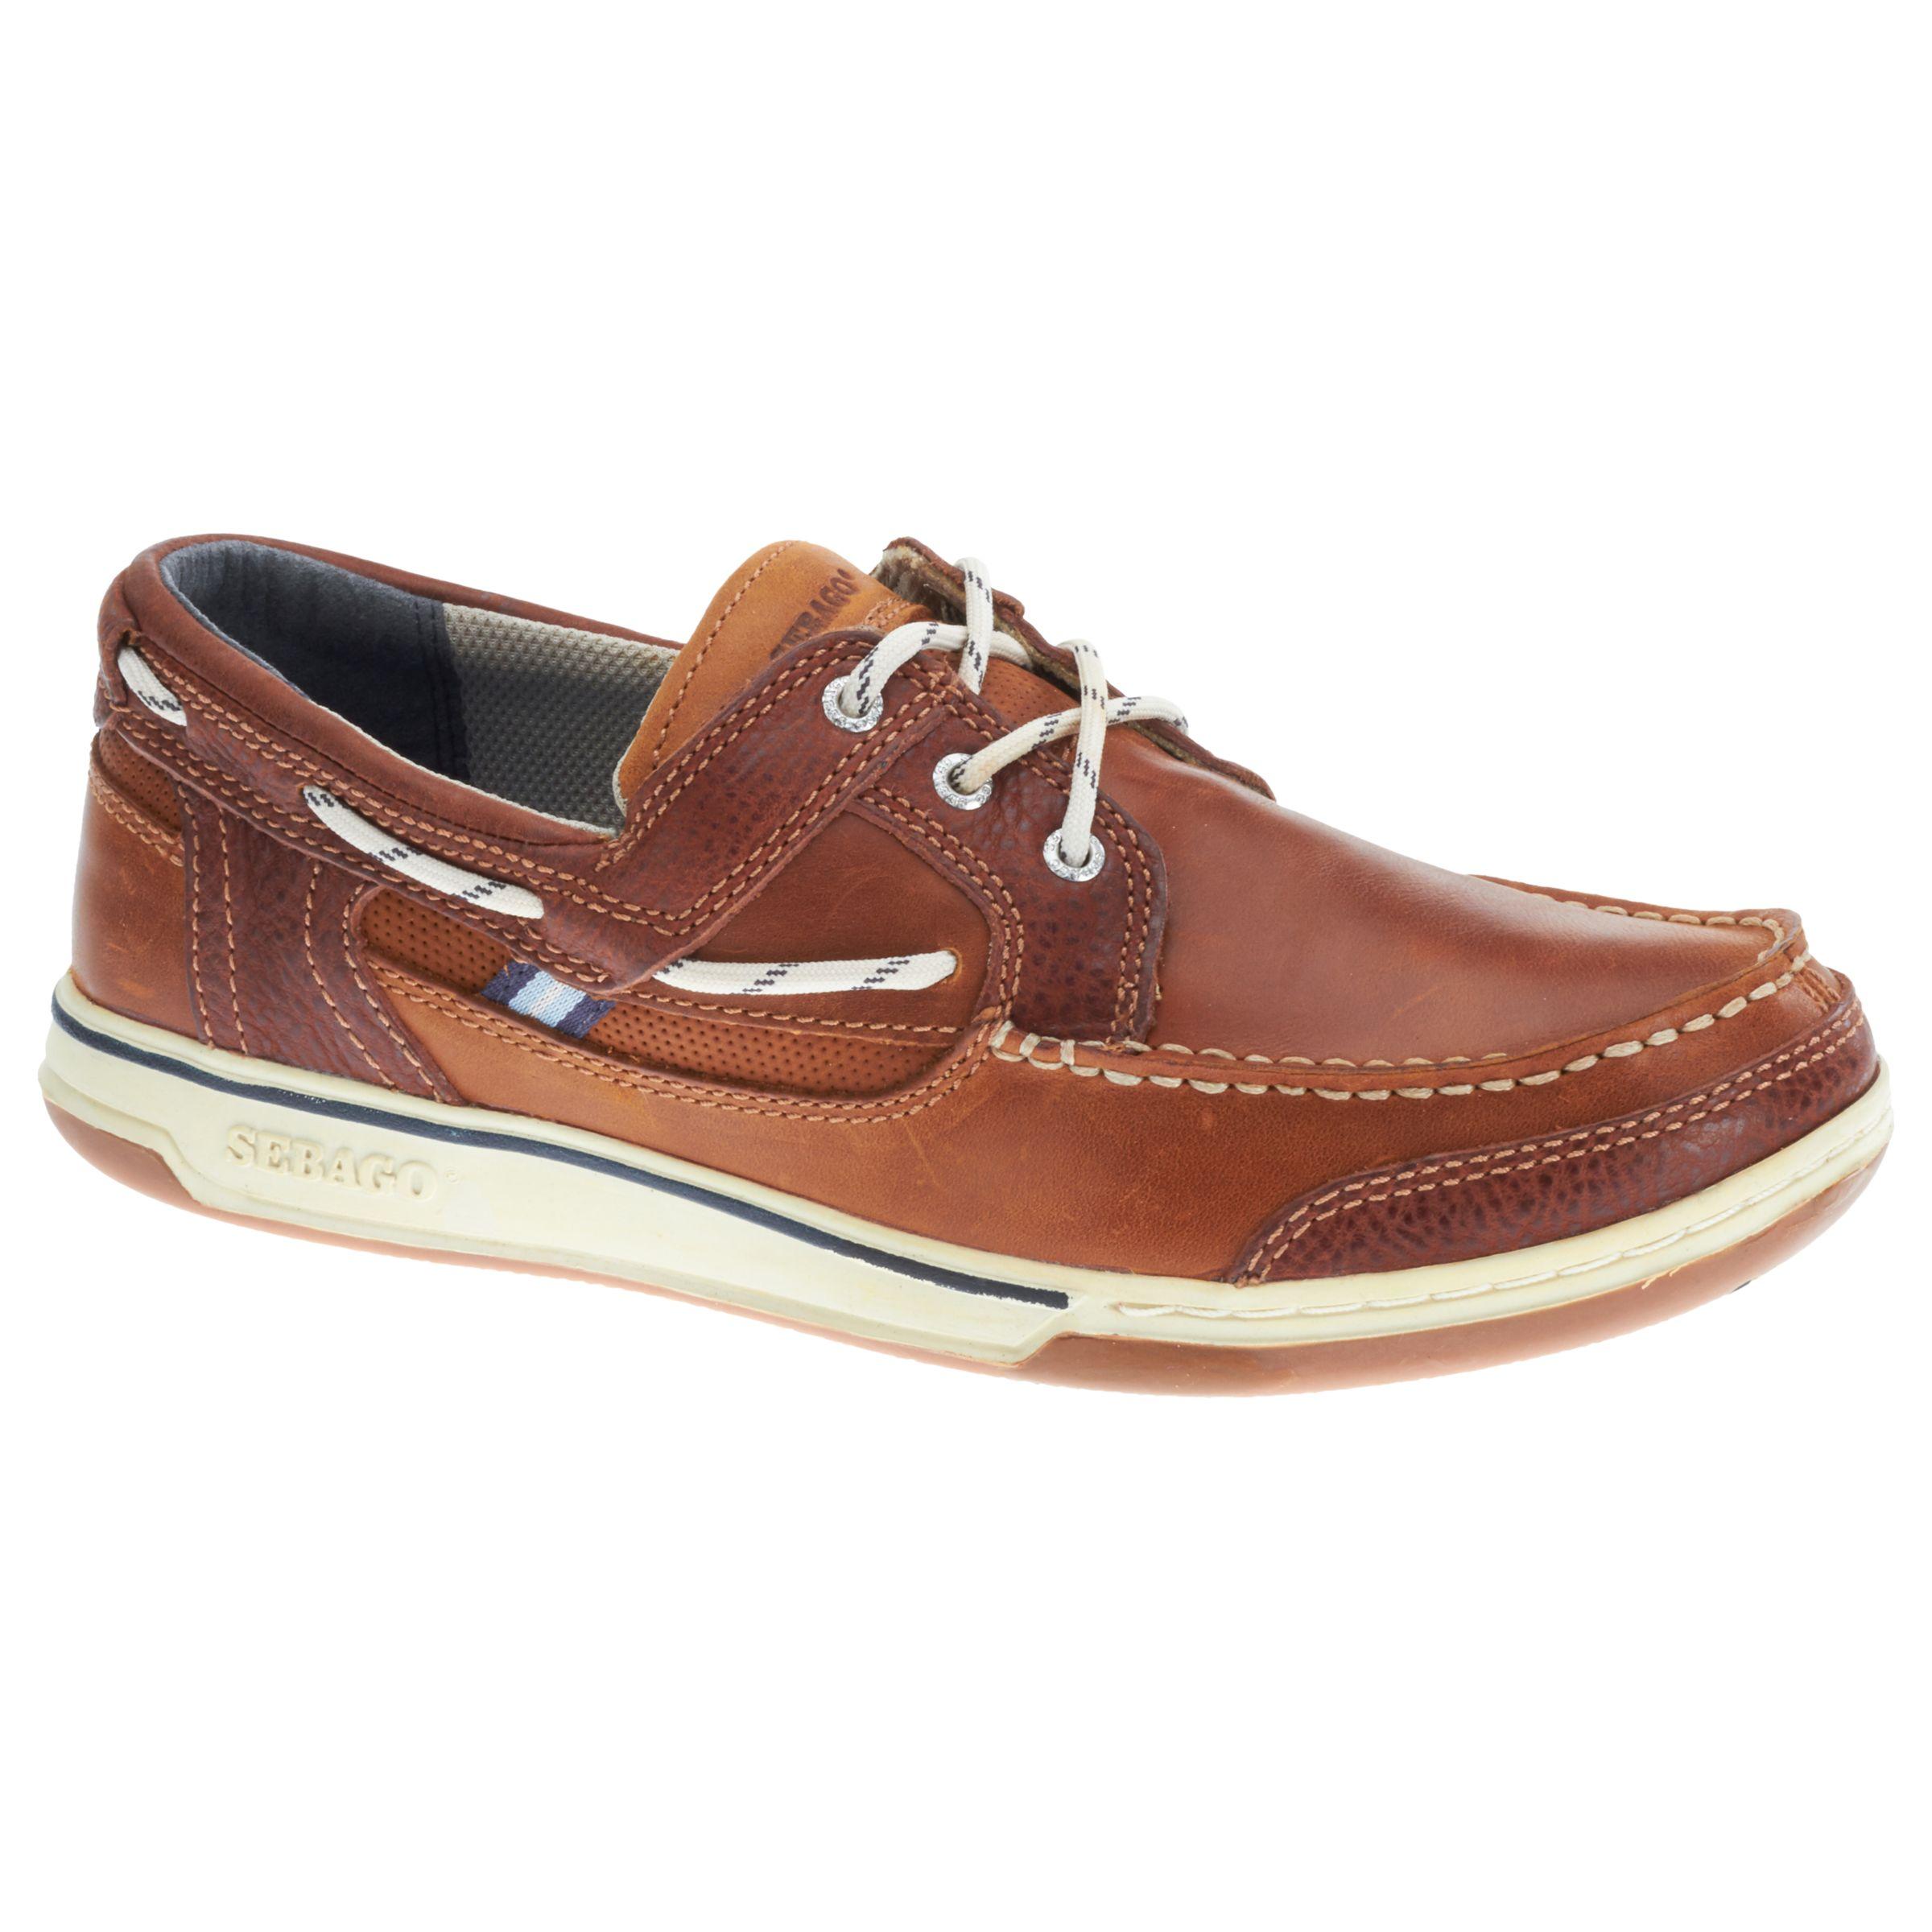 Sebago Sebago Triton 3-Eyelet Leather Boat Shoes, British Tan/Brown